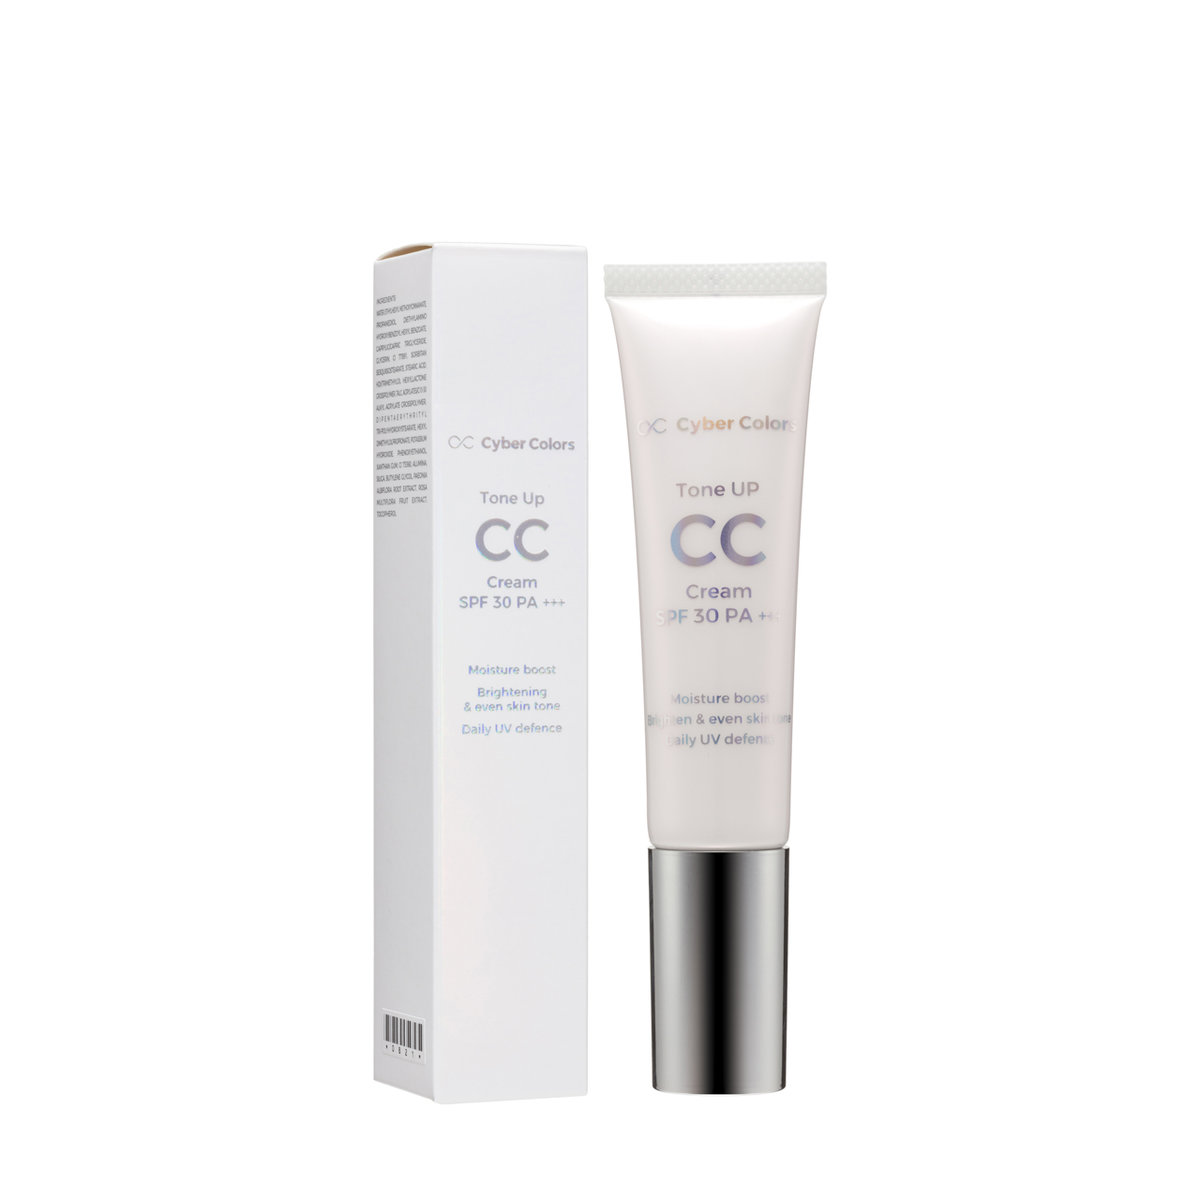 Tone Up CC Cream SPF30 PA+++ (35g)